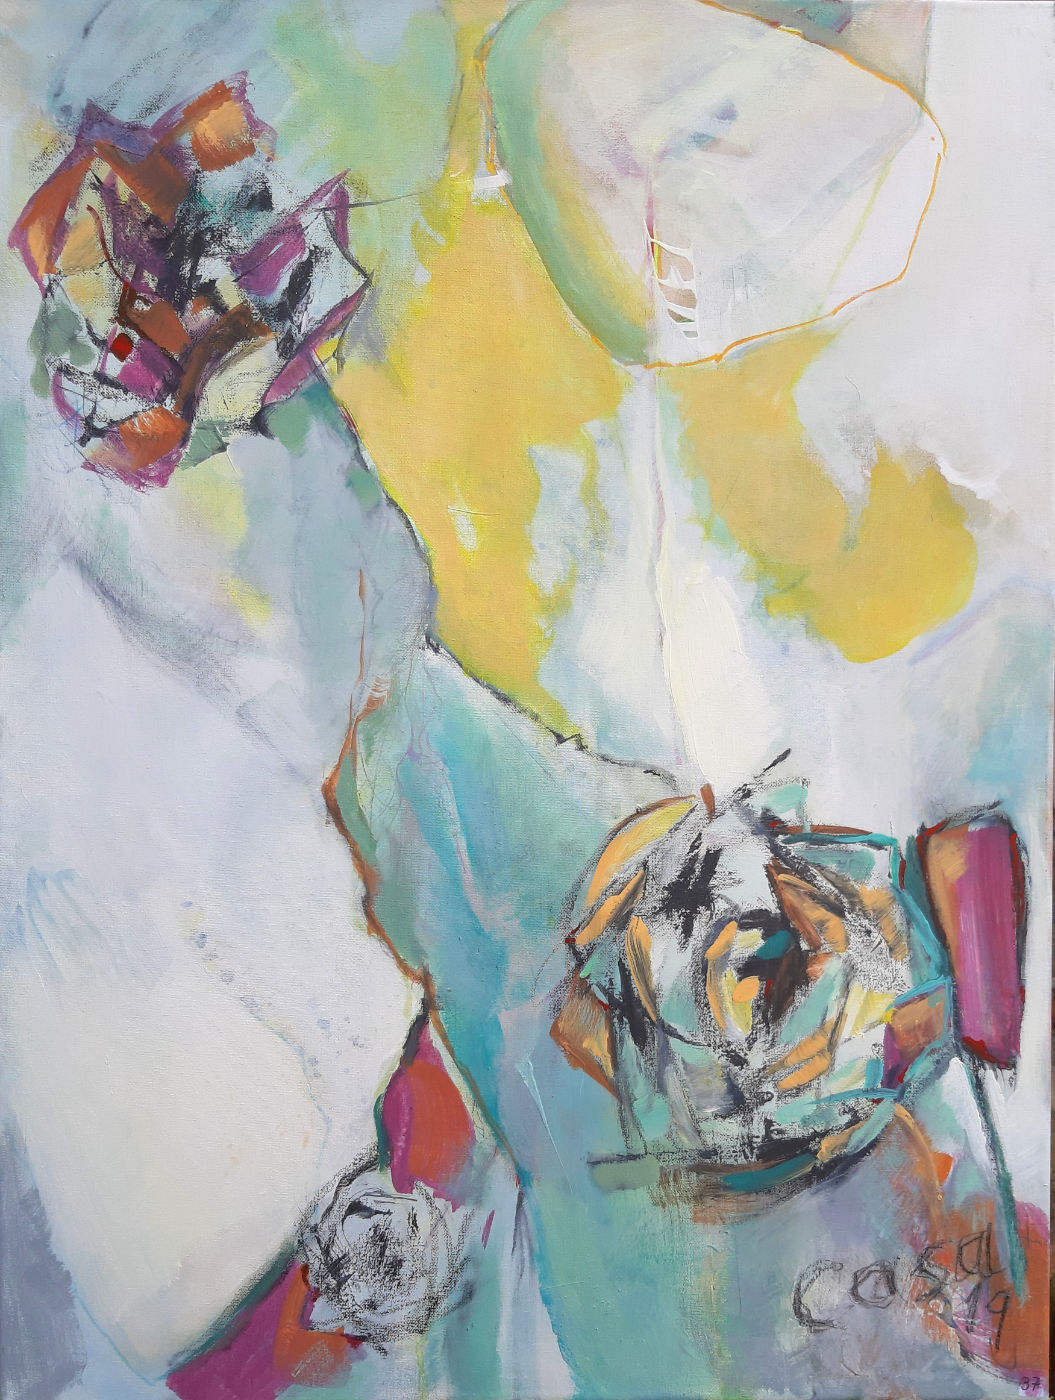 Verbindung zum Du - Acryl, mixed media auf Leinwand, 80 x 60 cm